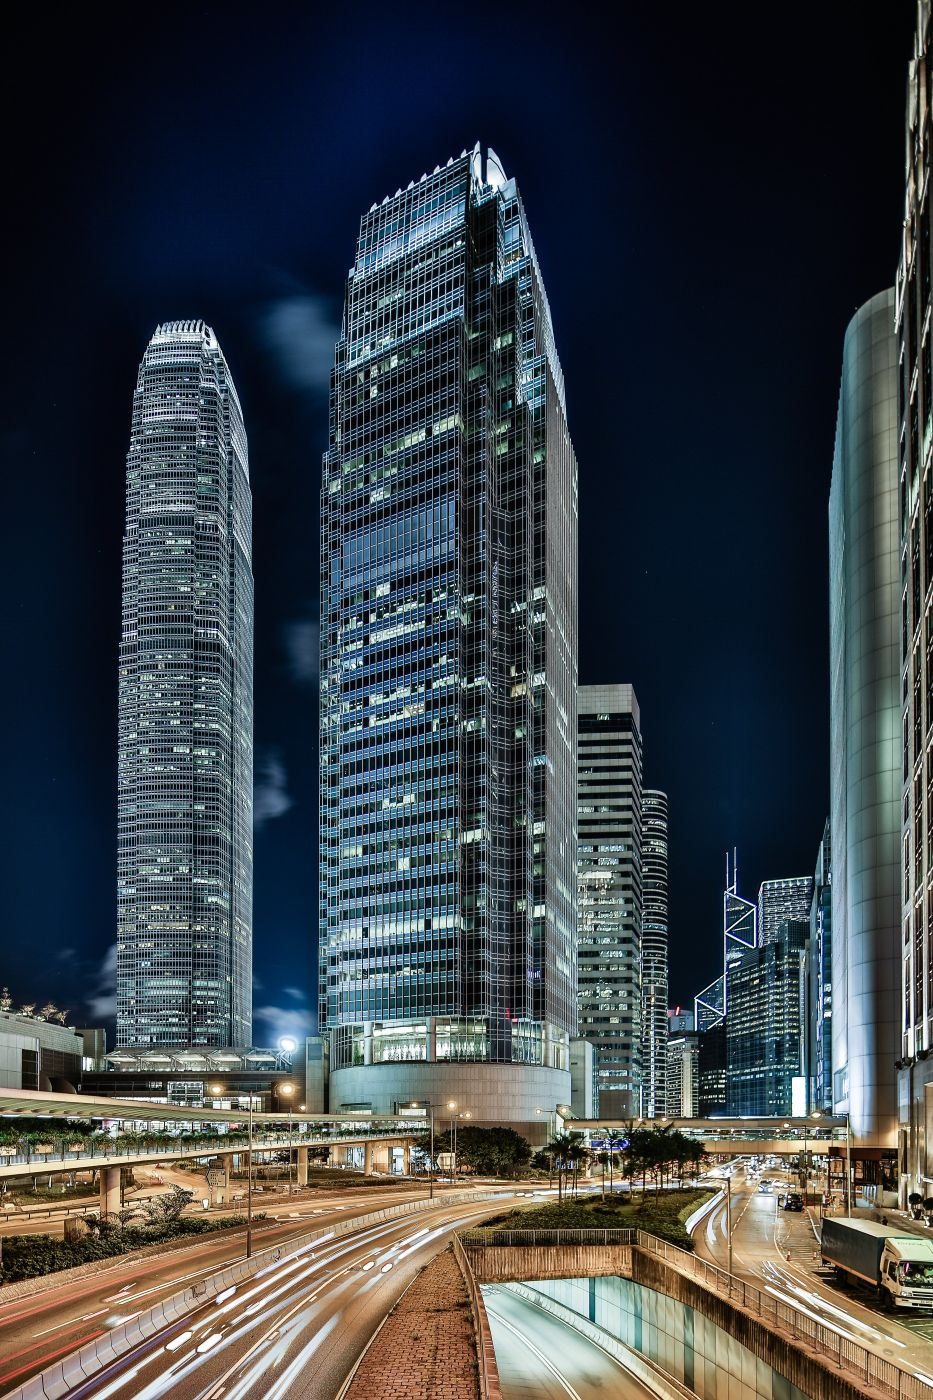 Hong Kong, IFC one and IFC two, Hong Kong